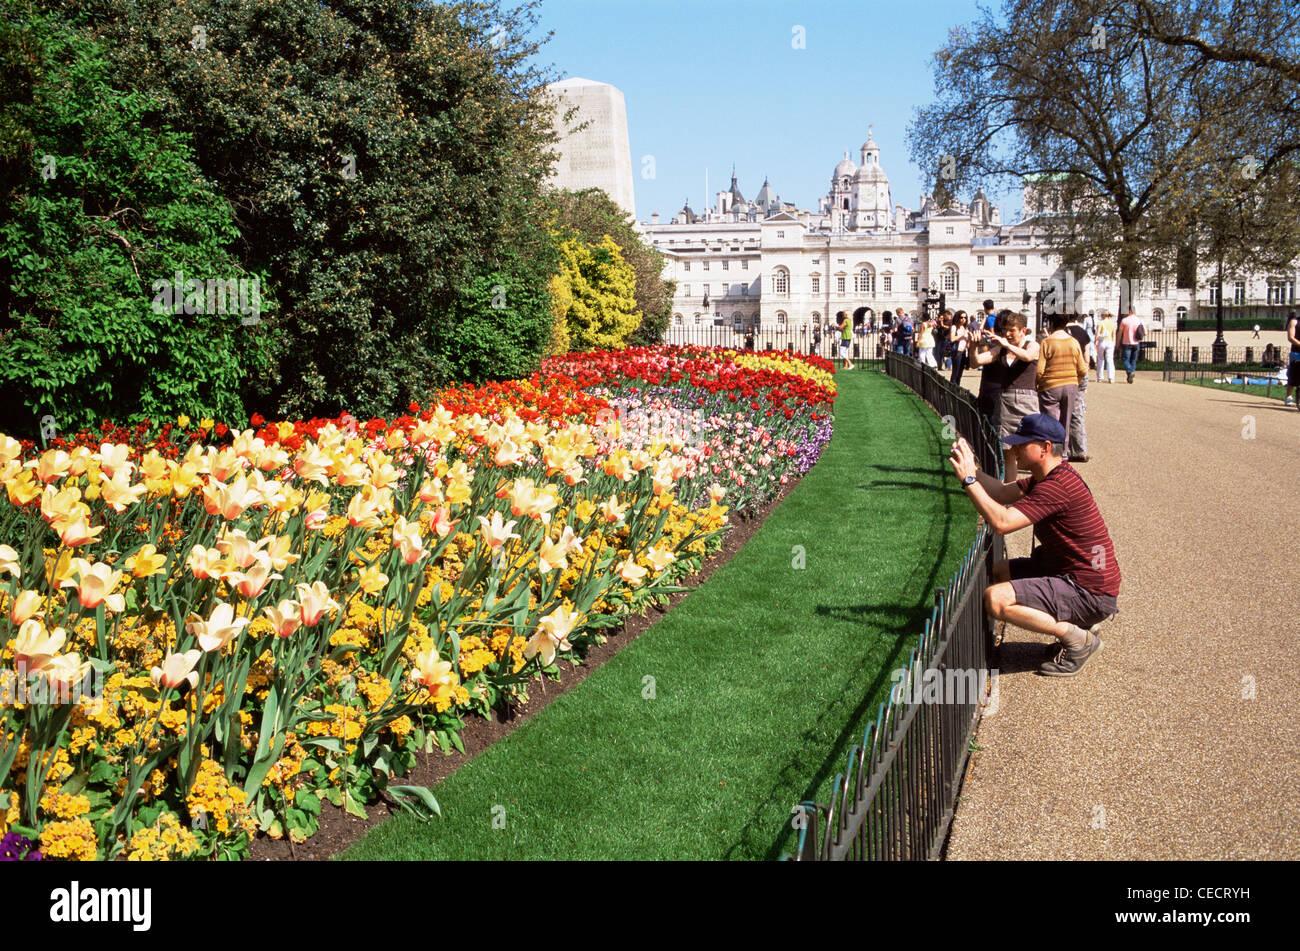 England london st james park spring flowers stock photo 43308149 england london st james park spring flowers mightylinksfo